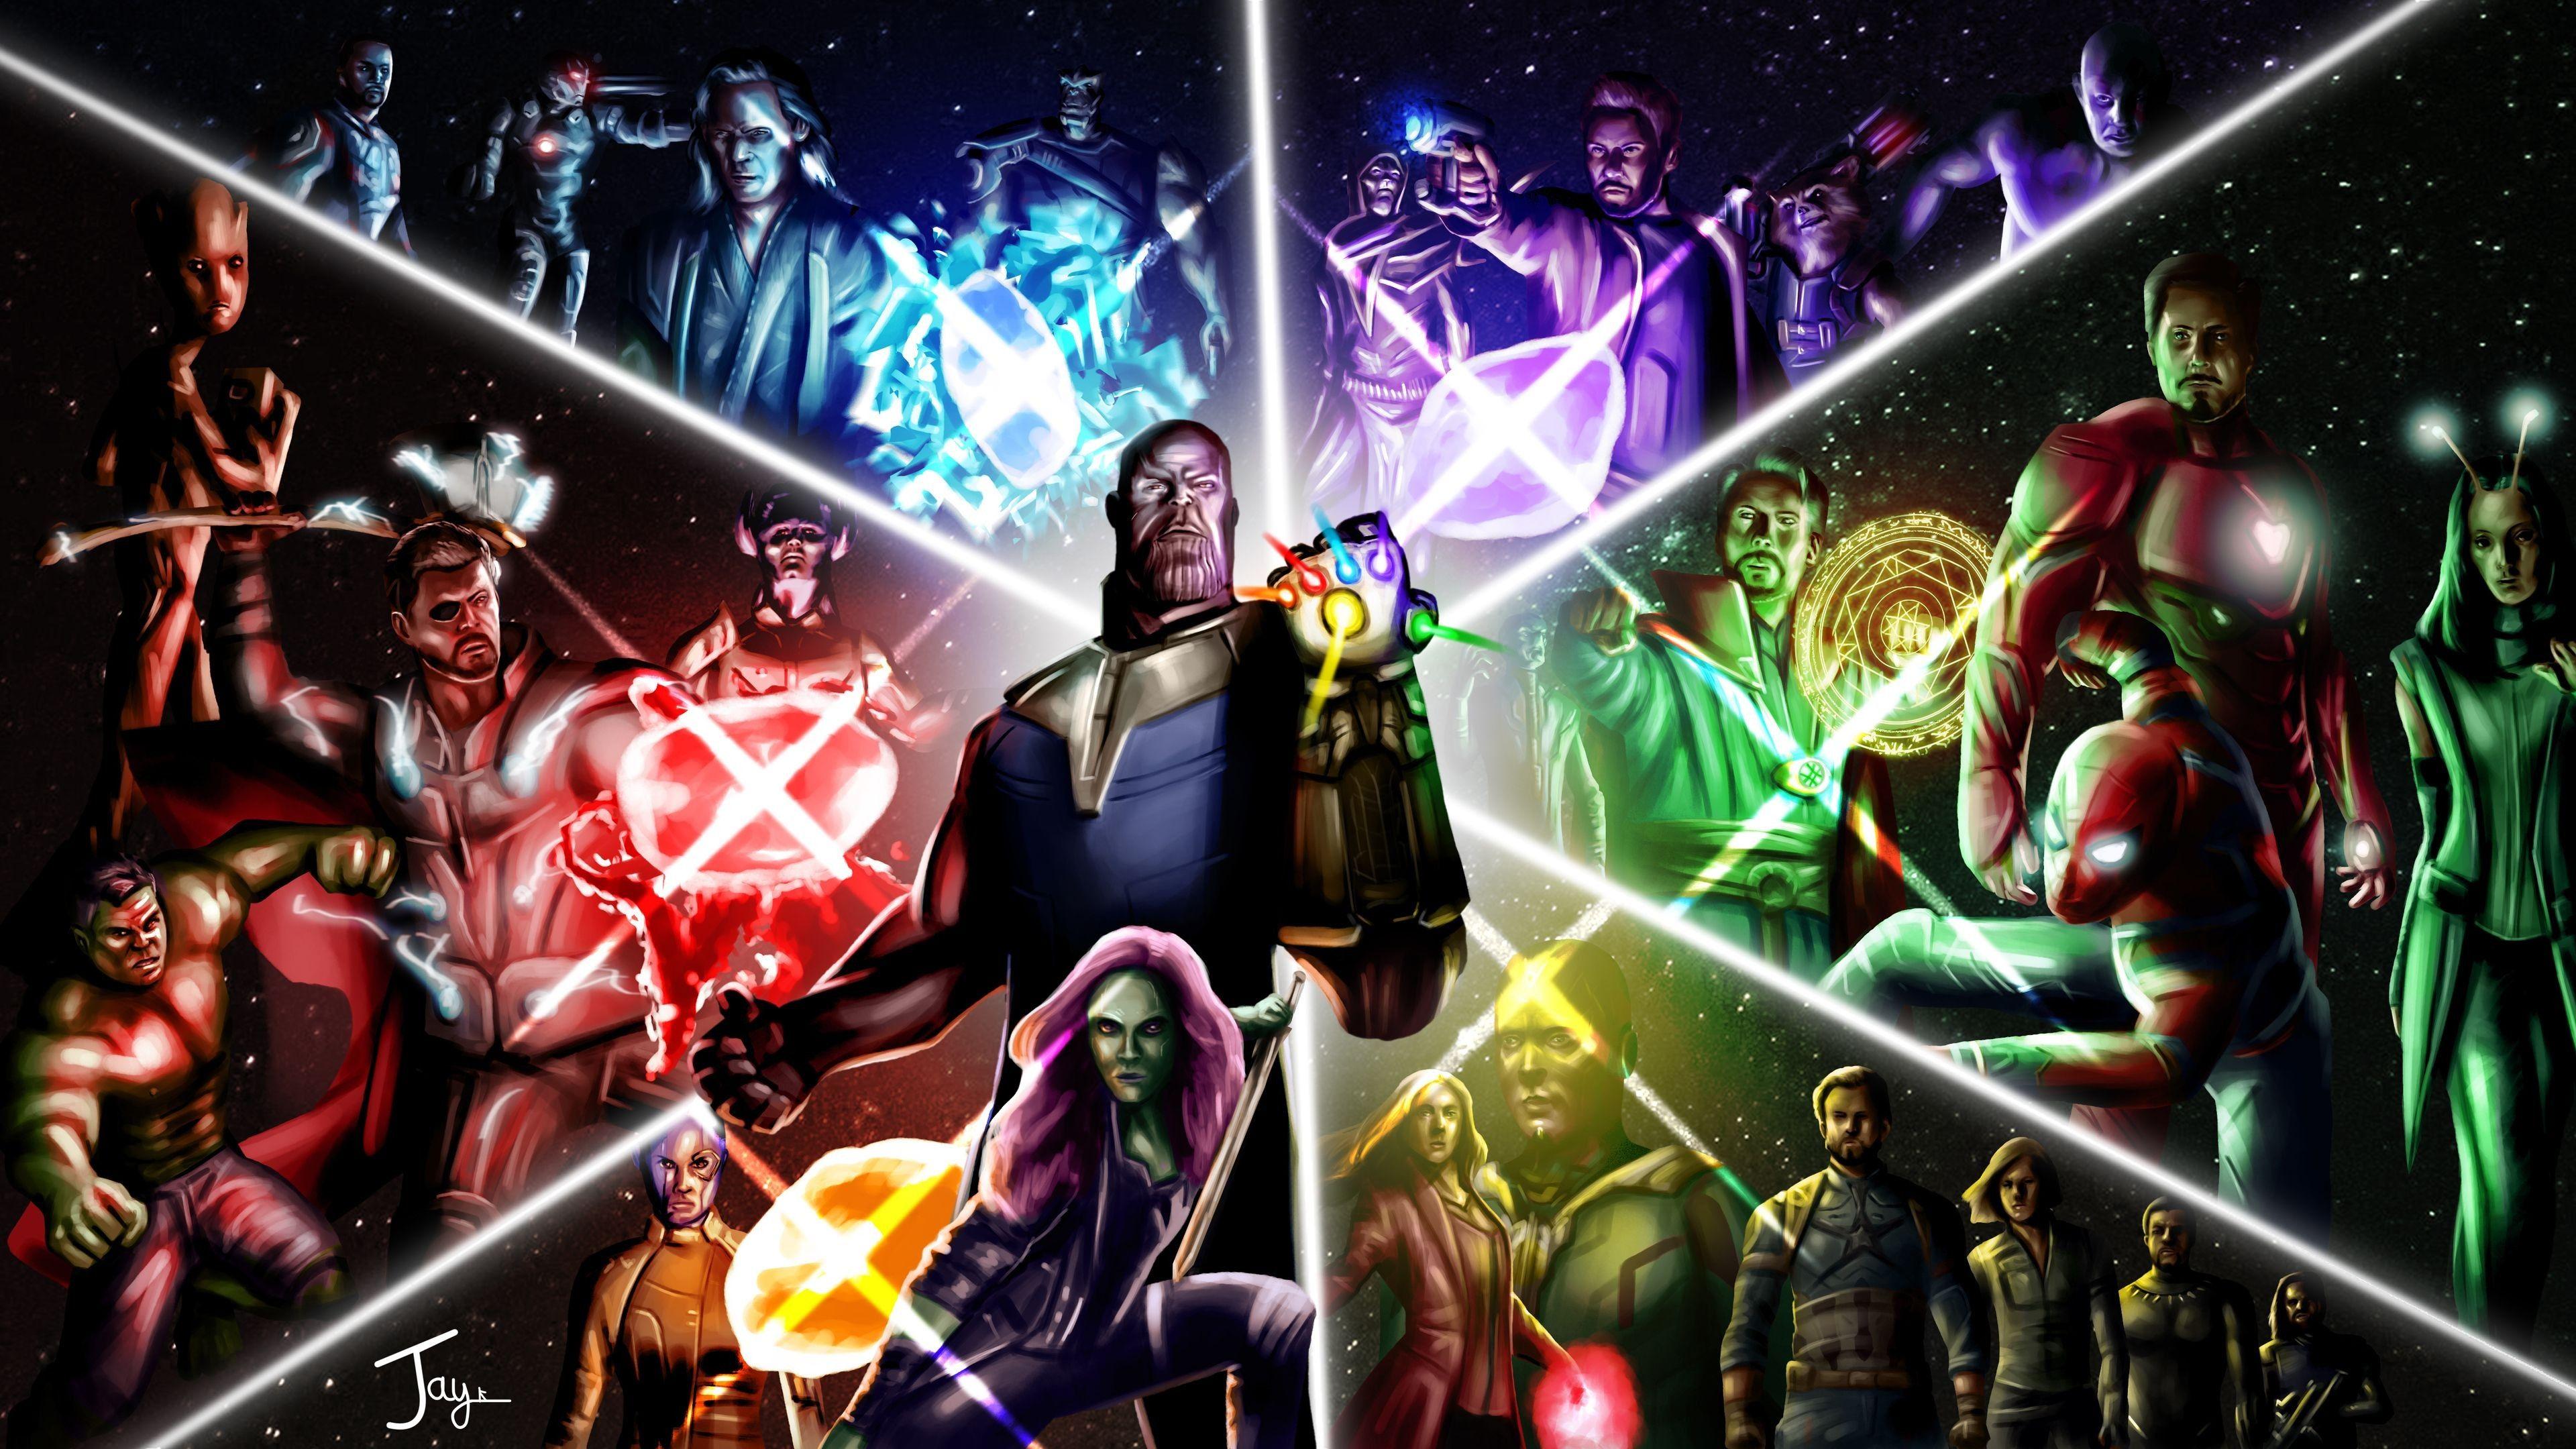 Beautiful Infinity Desktop Wallpaper Avengers Infinity War Poster Marvel Infinity War Infinity War Poster